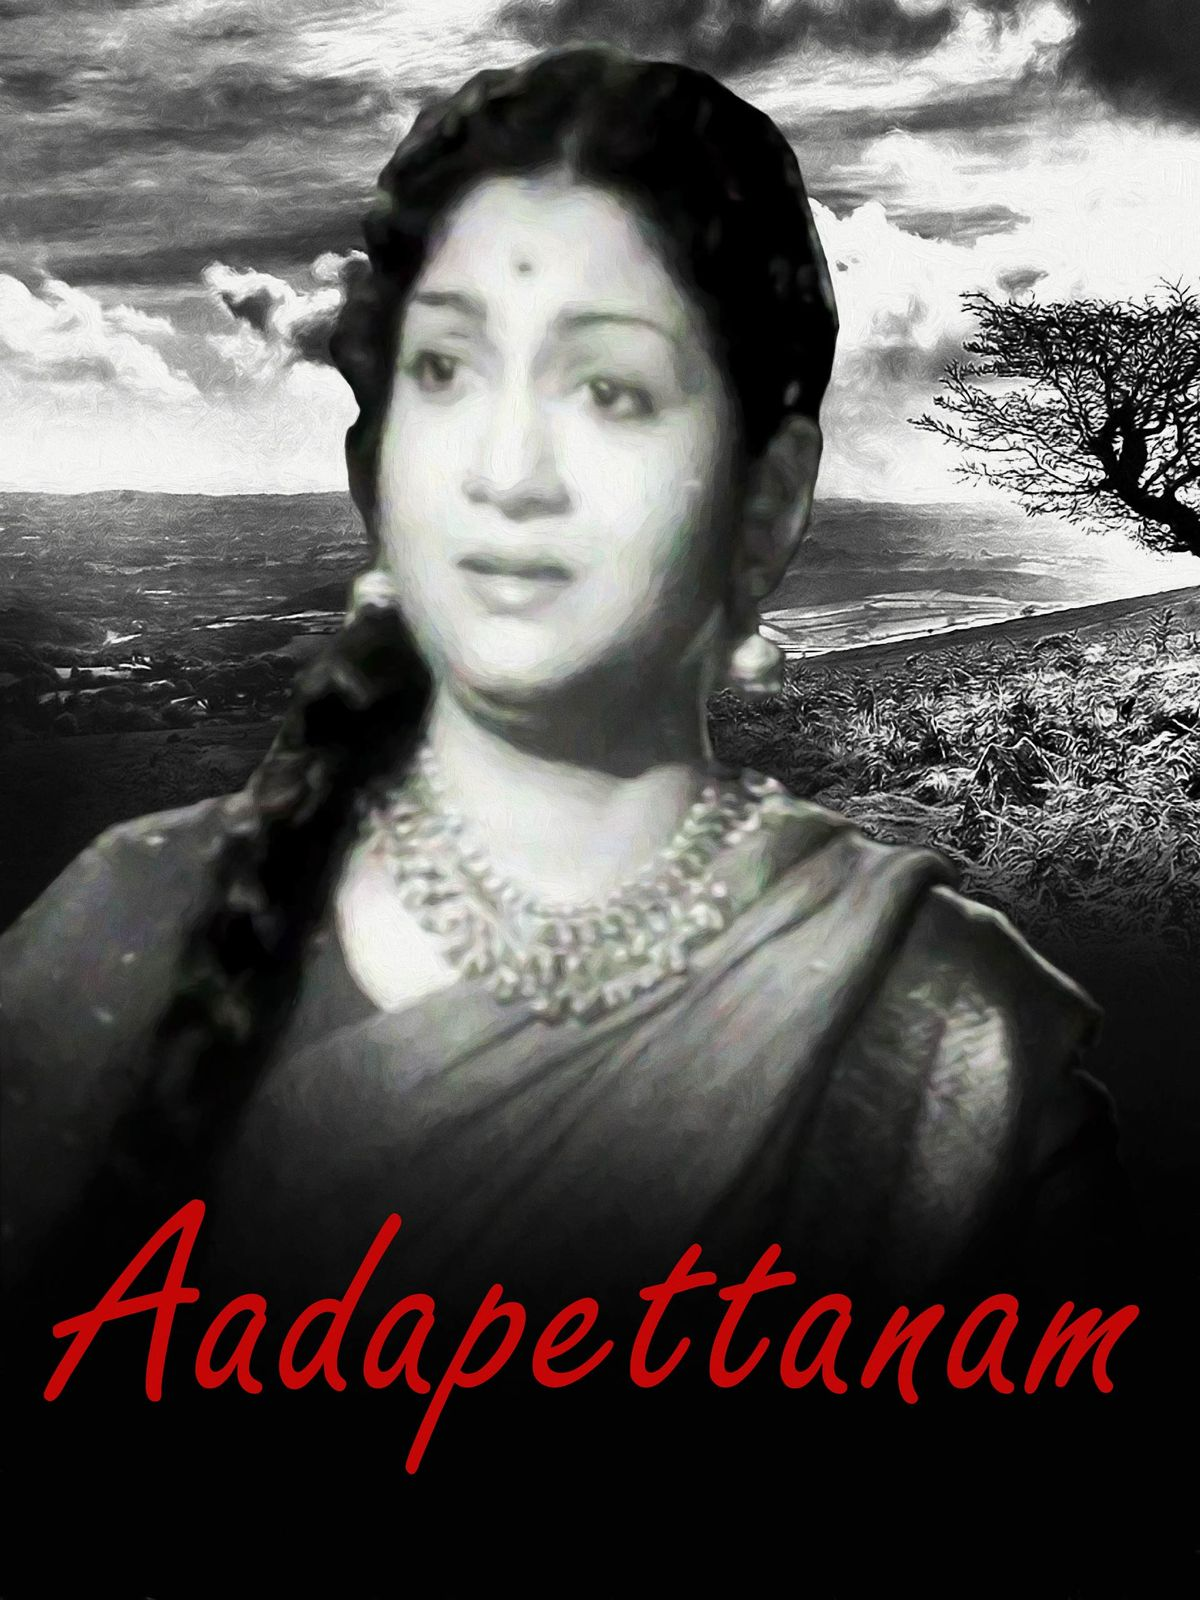 Akkineni Nageswara Rao Best Movies, TV Shows and Web Series List